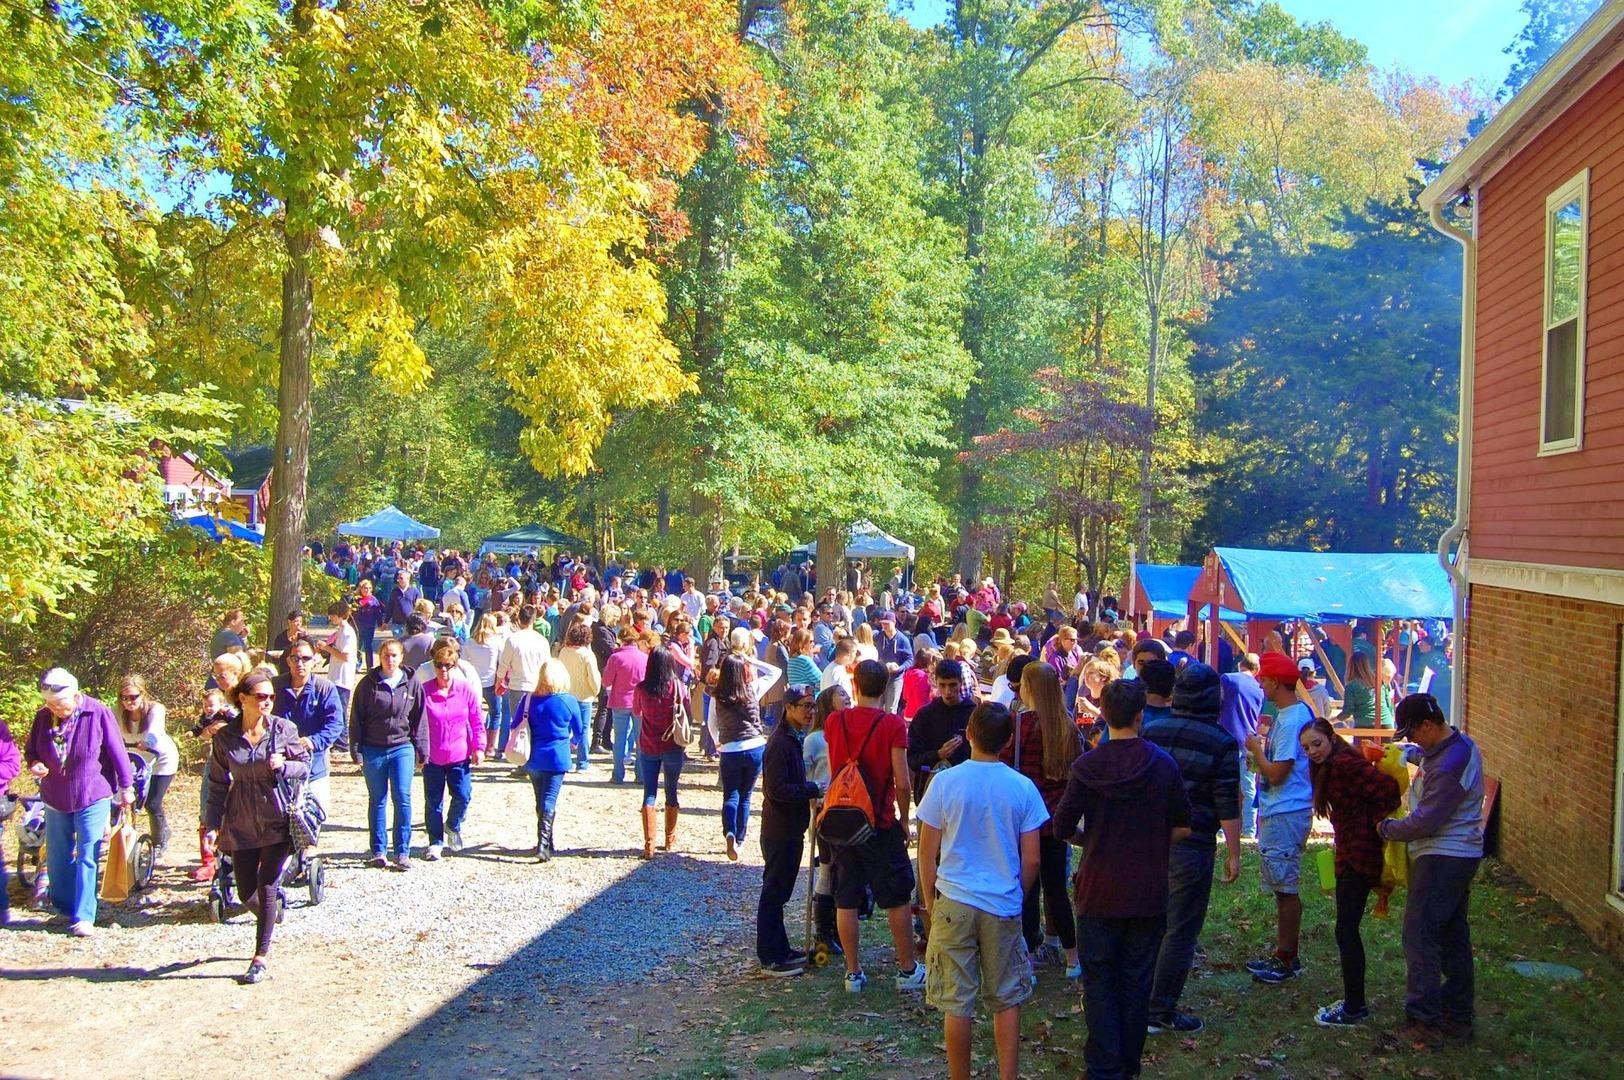 NRT's 48th Annual Harvest and Craft Fair